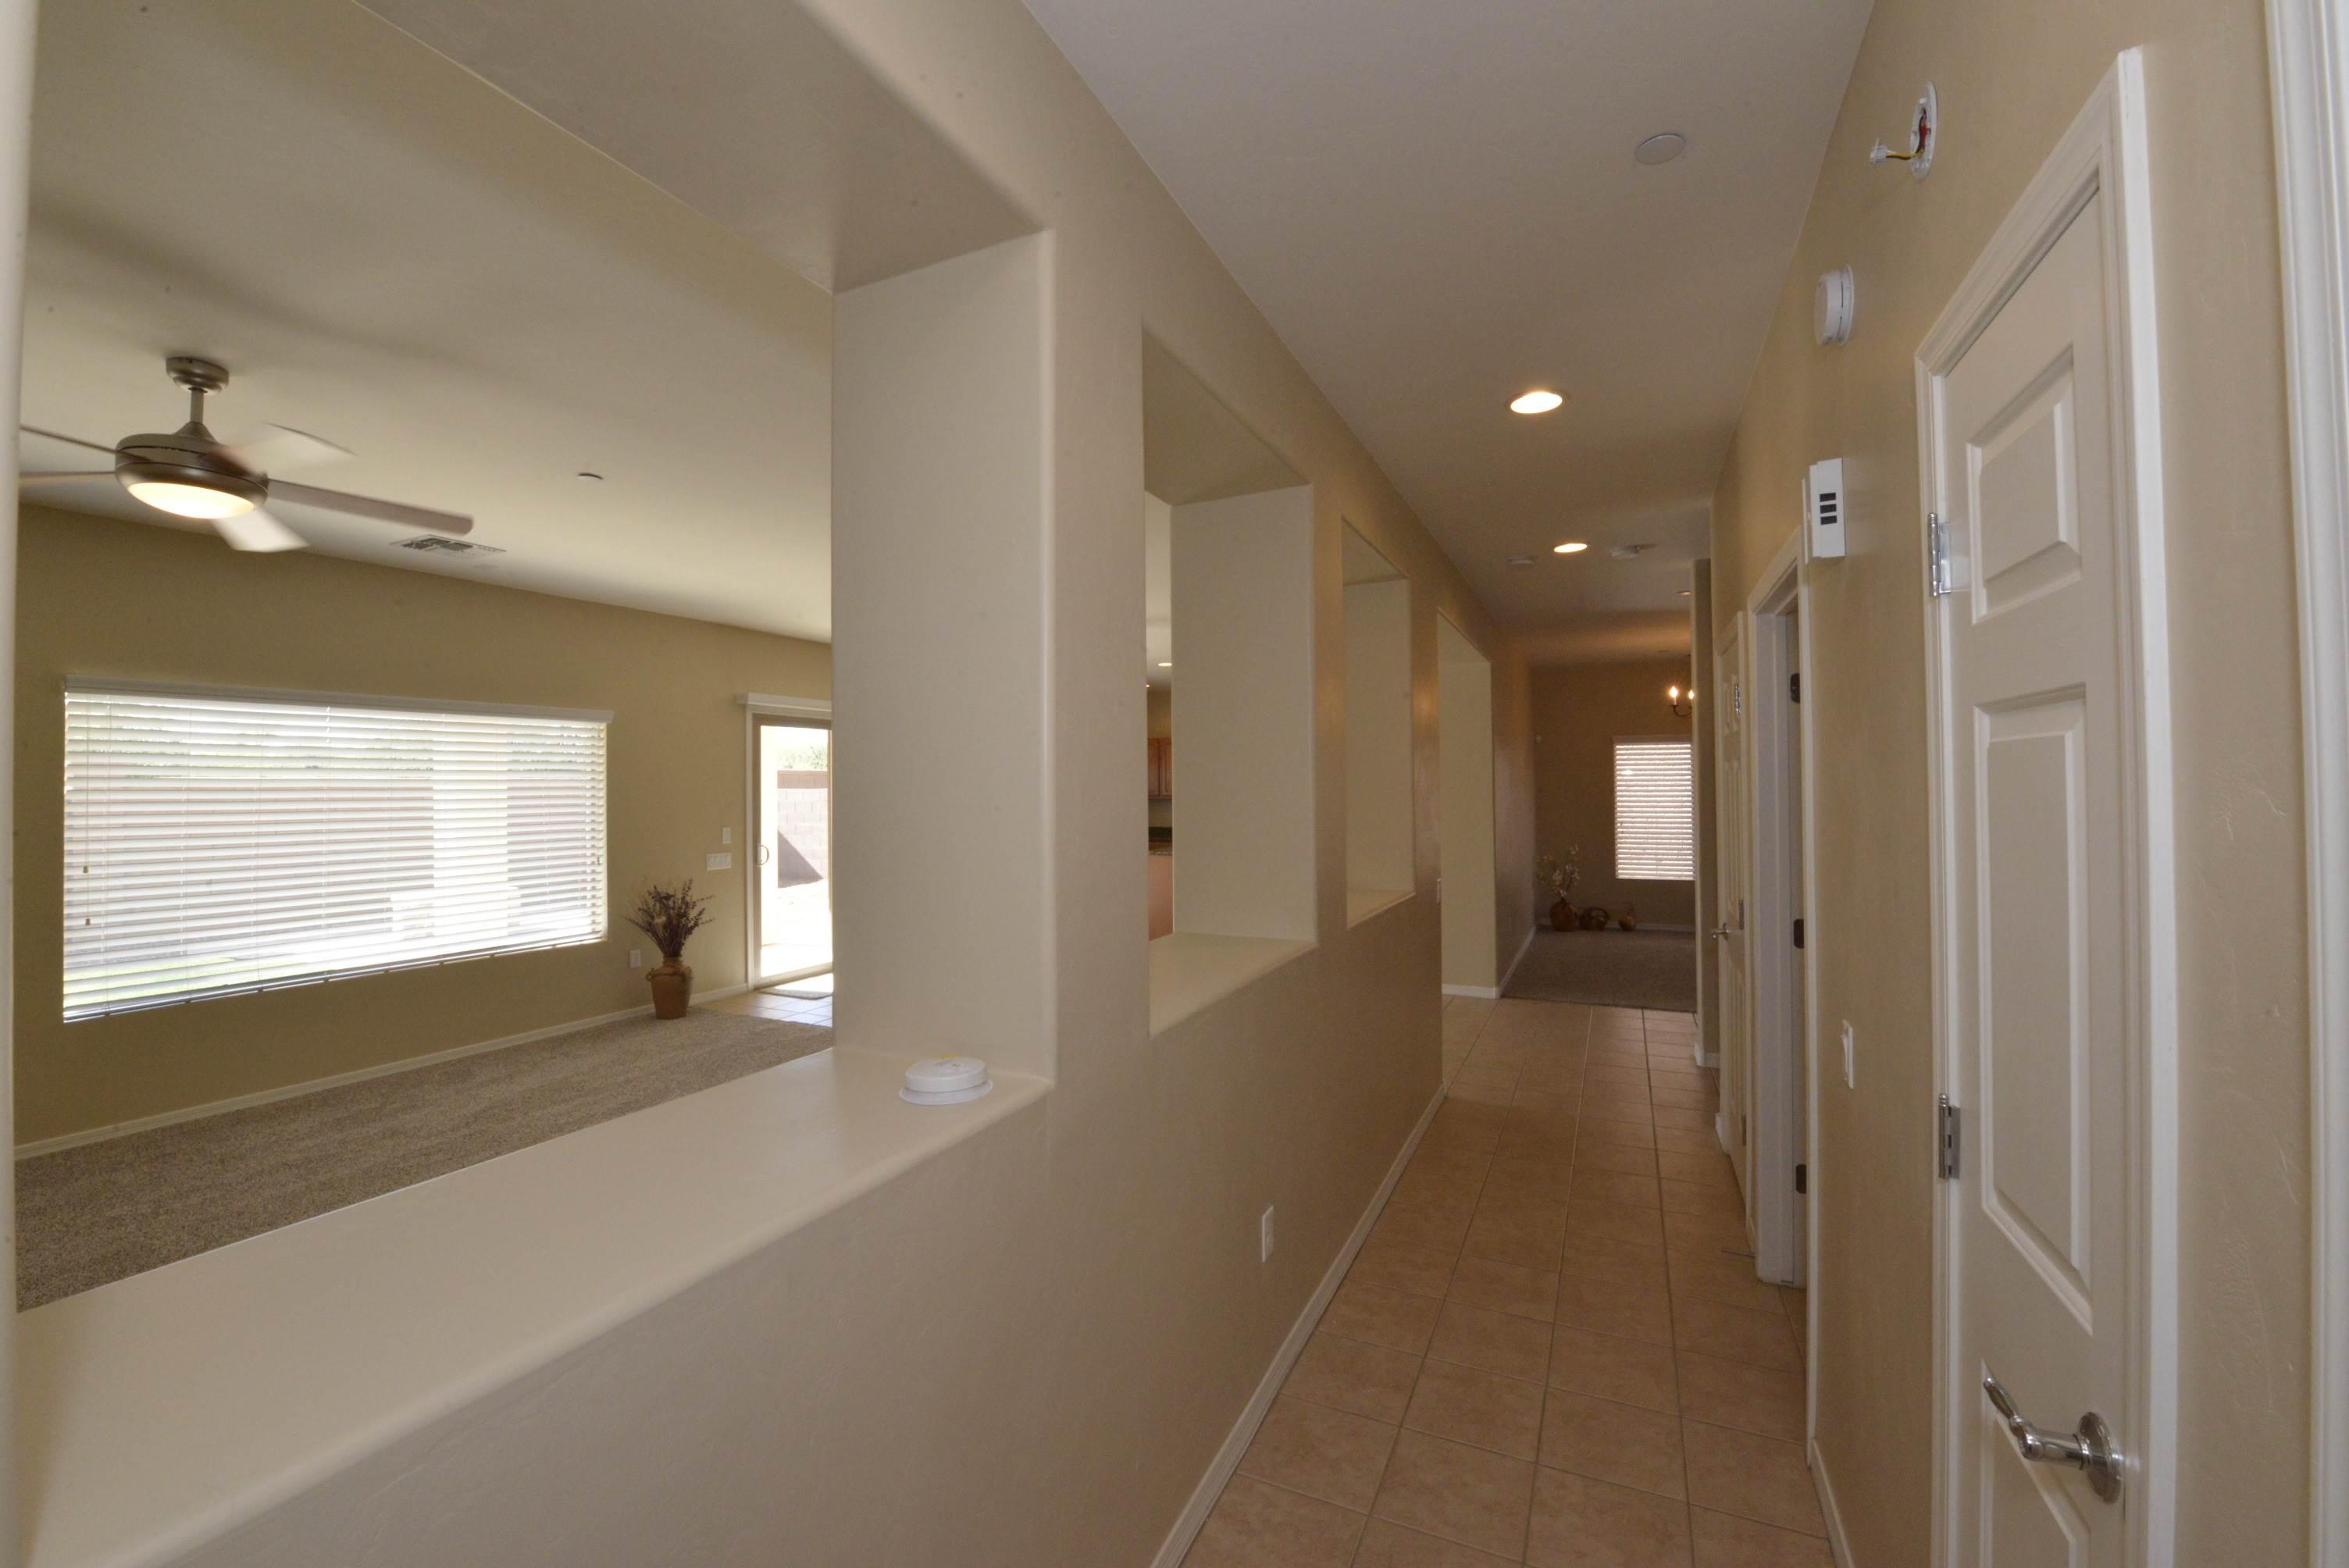 863 West Via De Gala, Sahuarita, AZ 85629